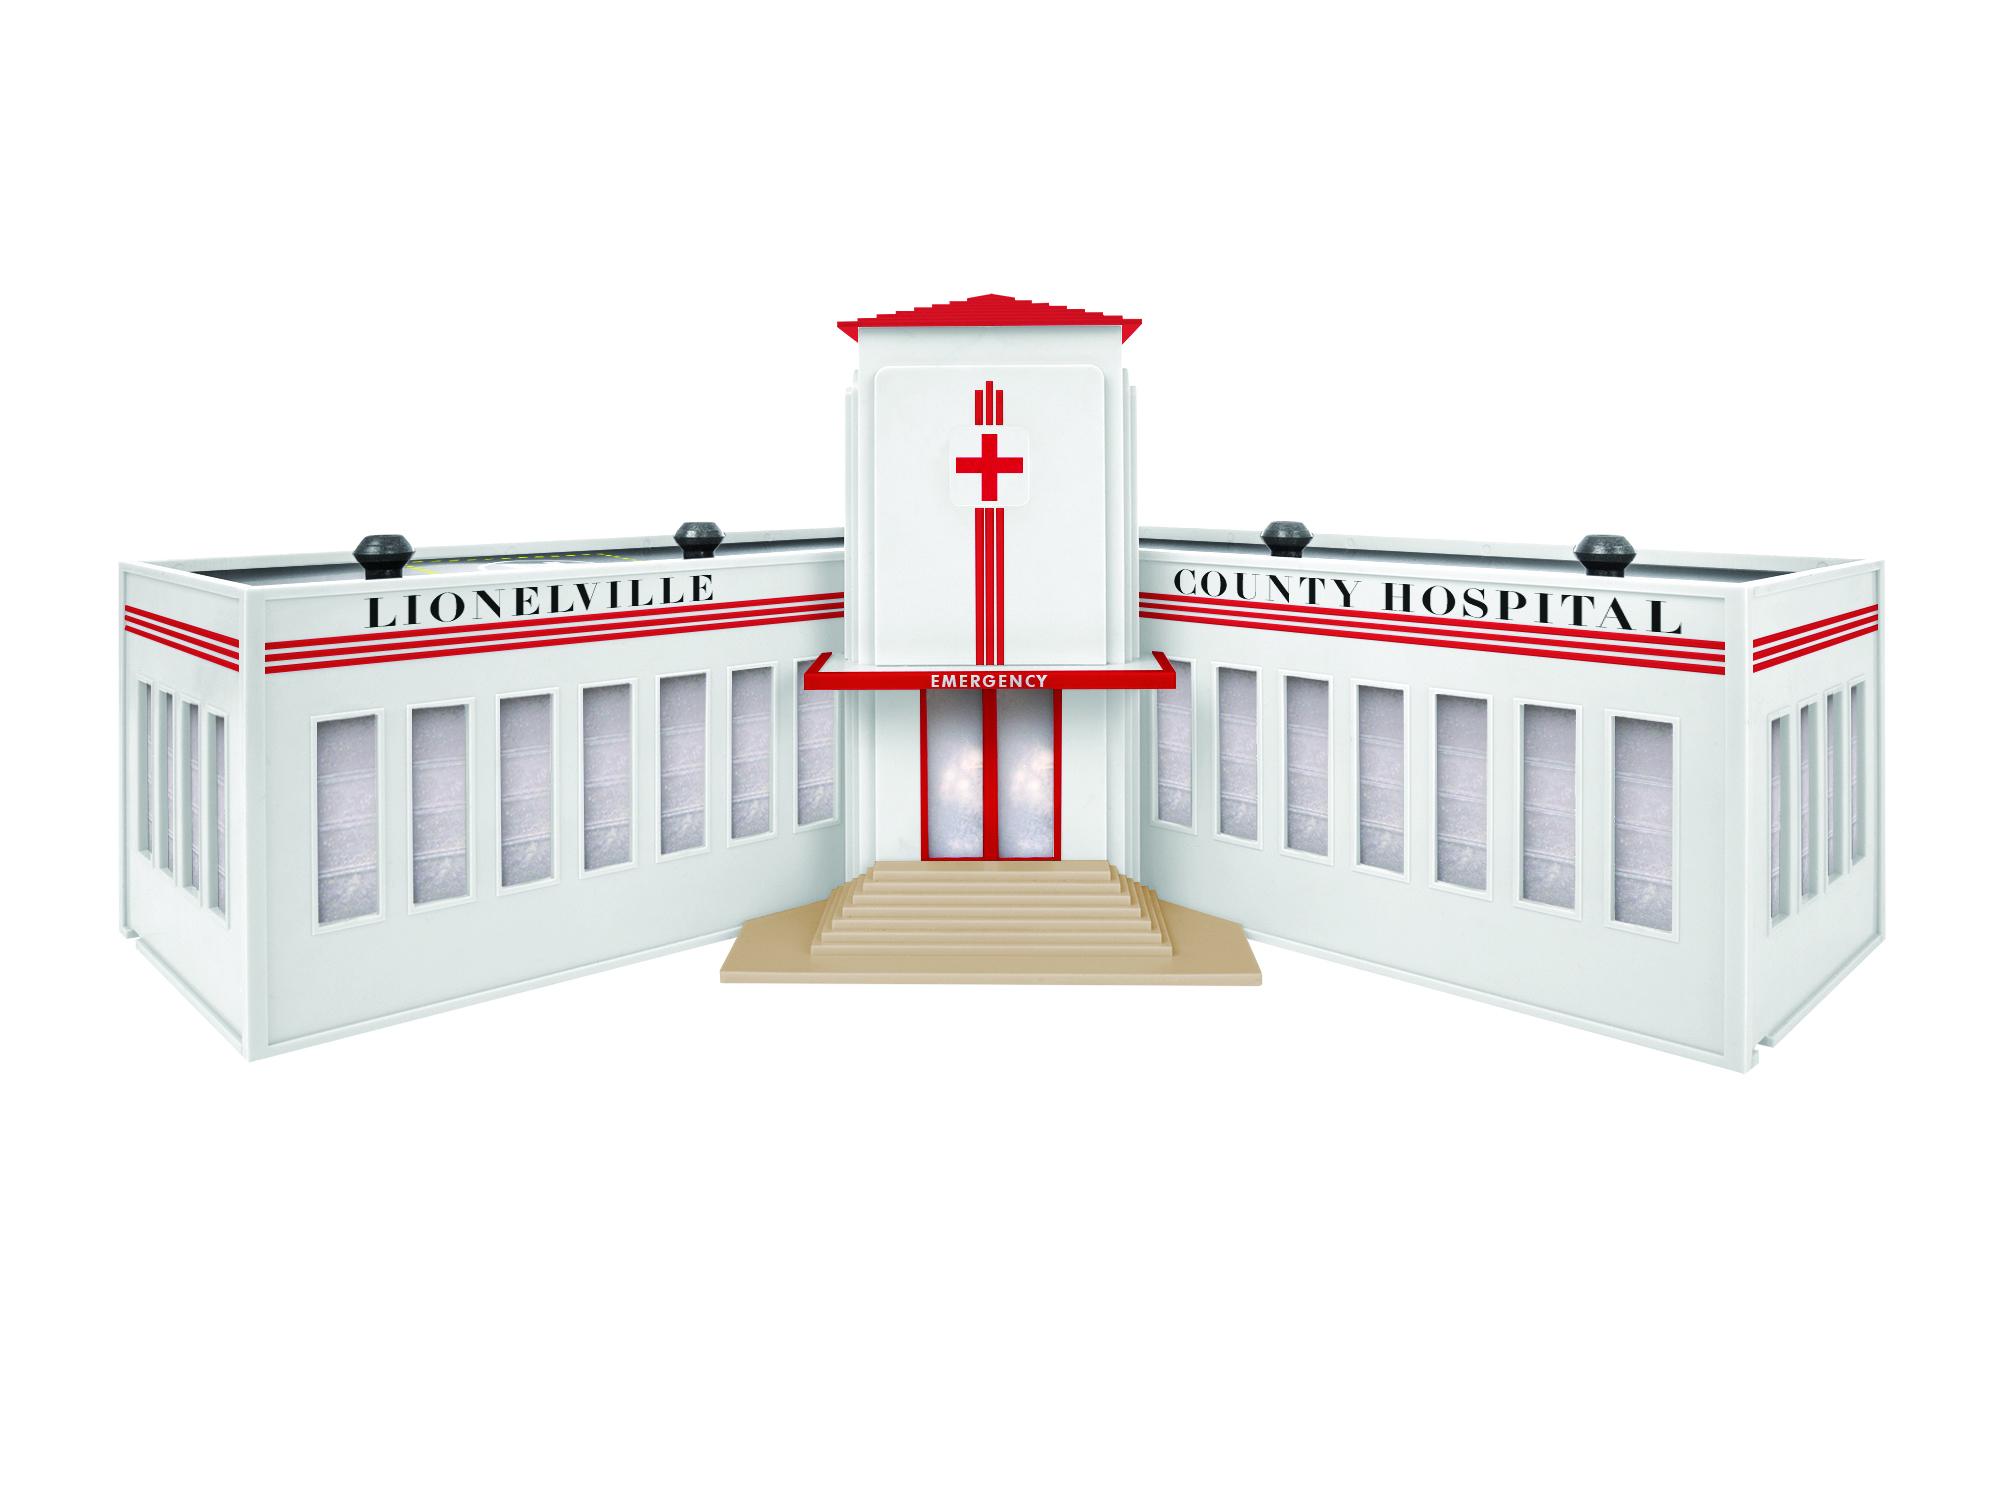 O Lionelville Hospital